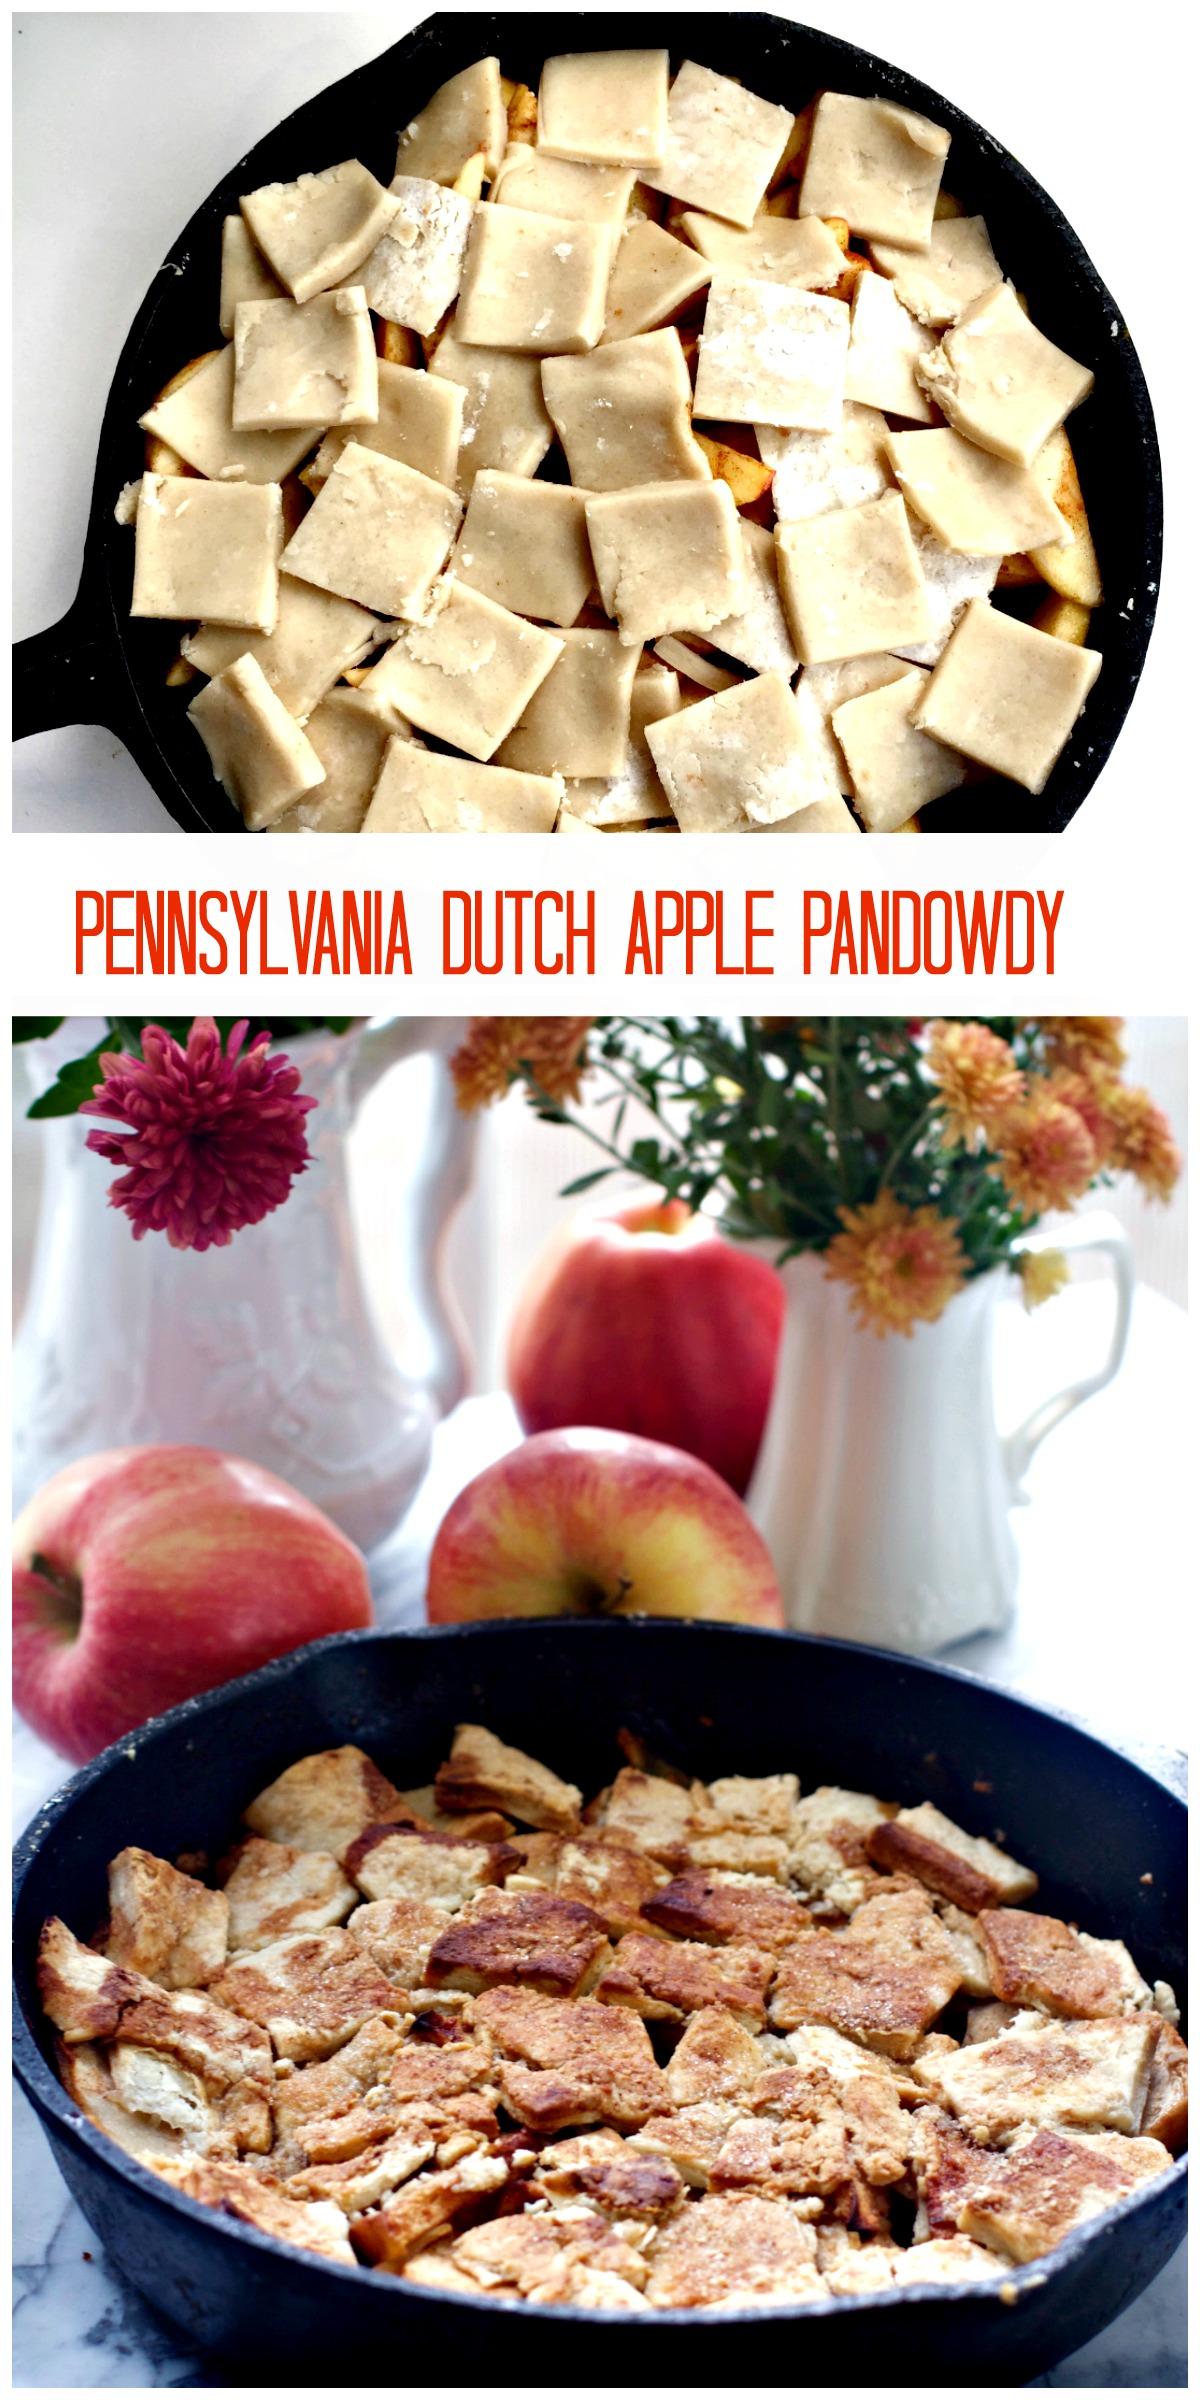 Amish Apple Pandowdy Dessert by Angela Roberts